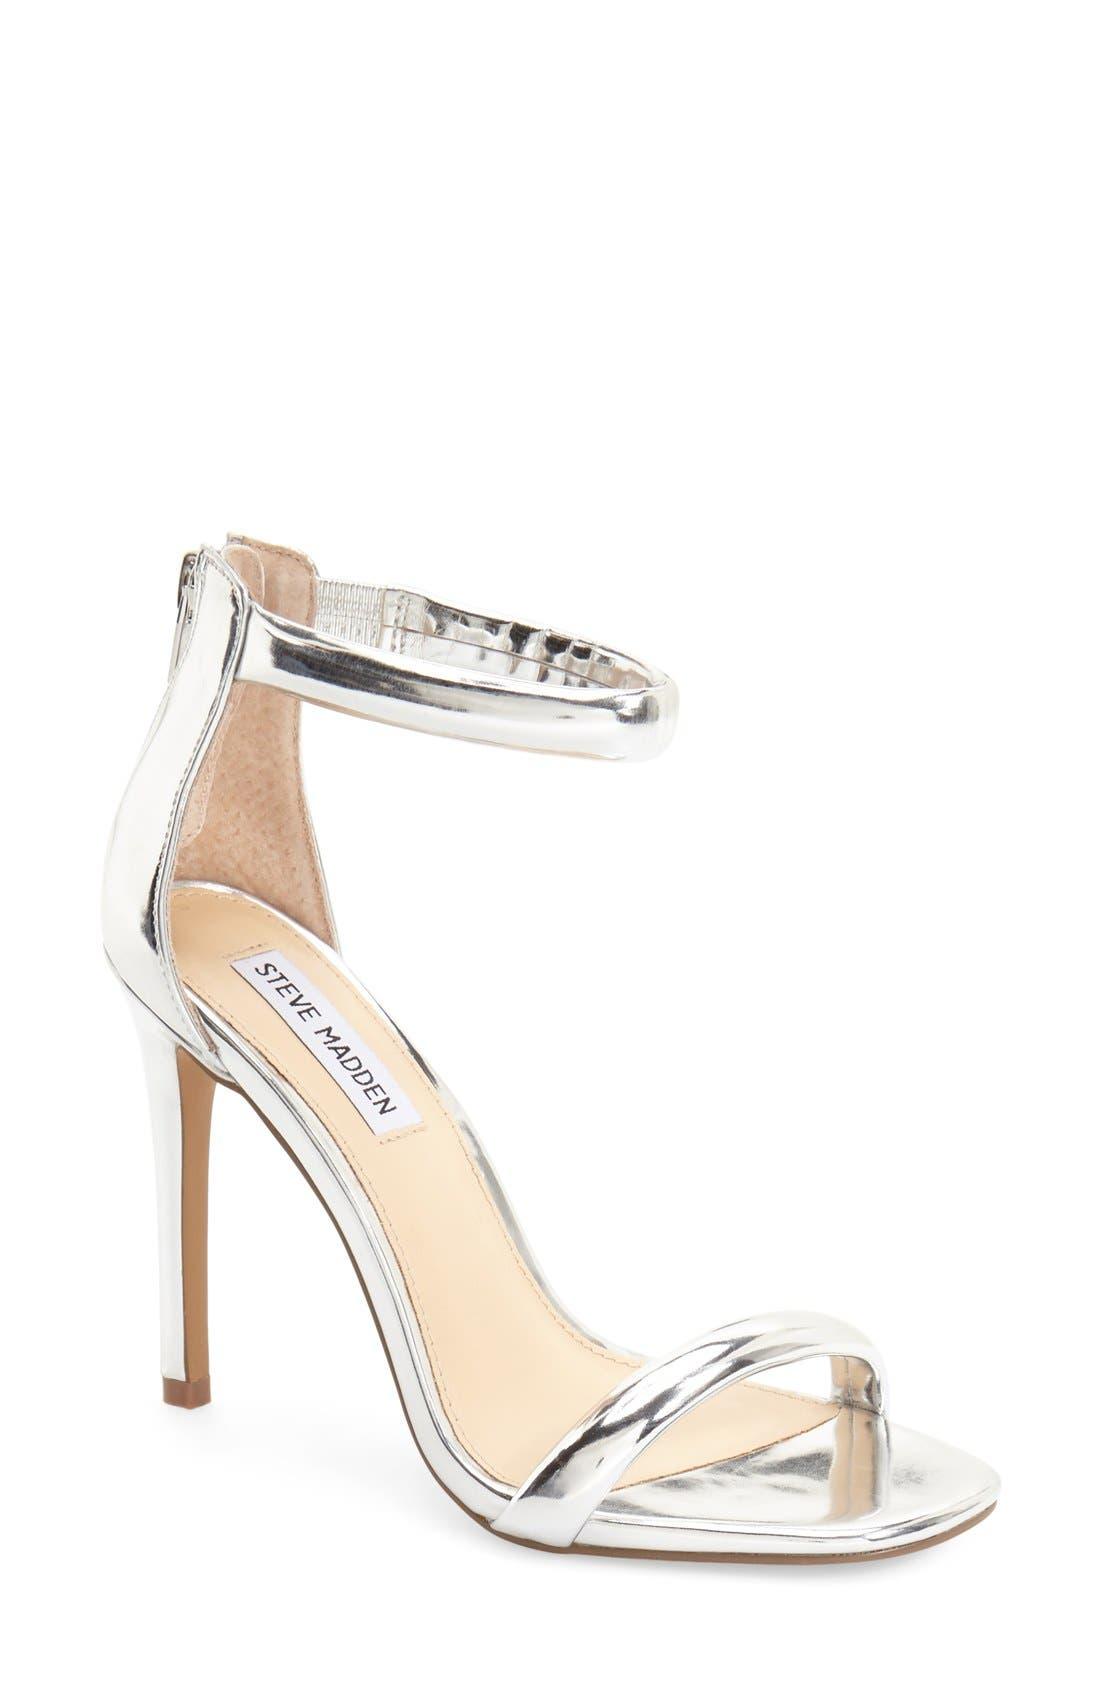 Main Image - Steve Madden 'Fancier' Ankle Strap Sandal (Women)